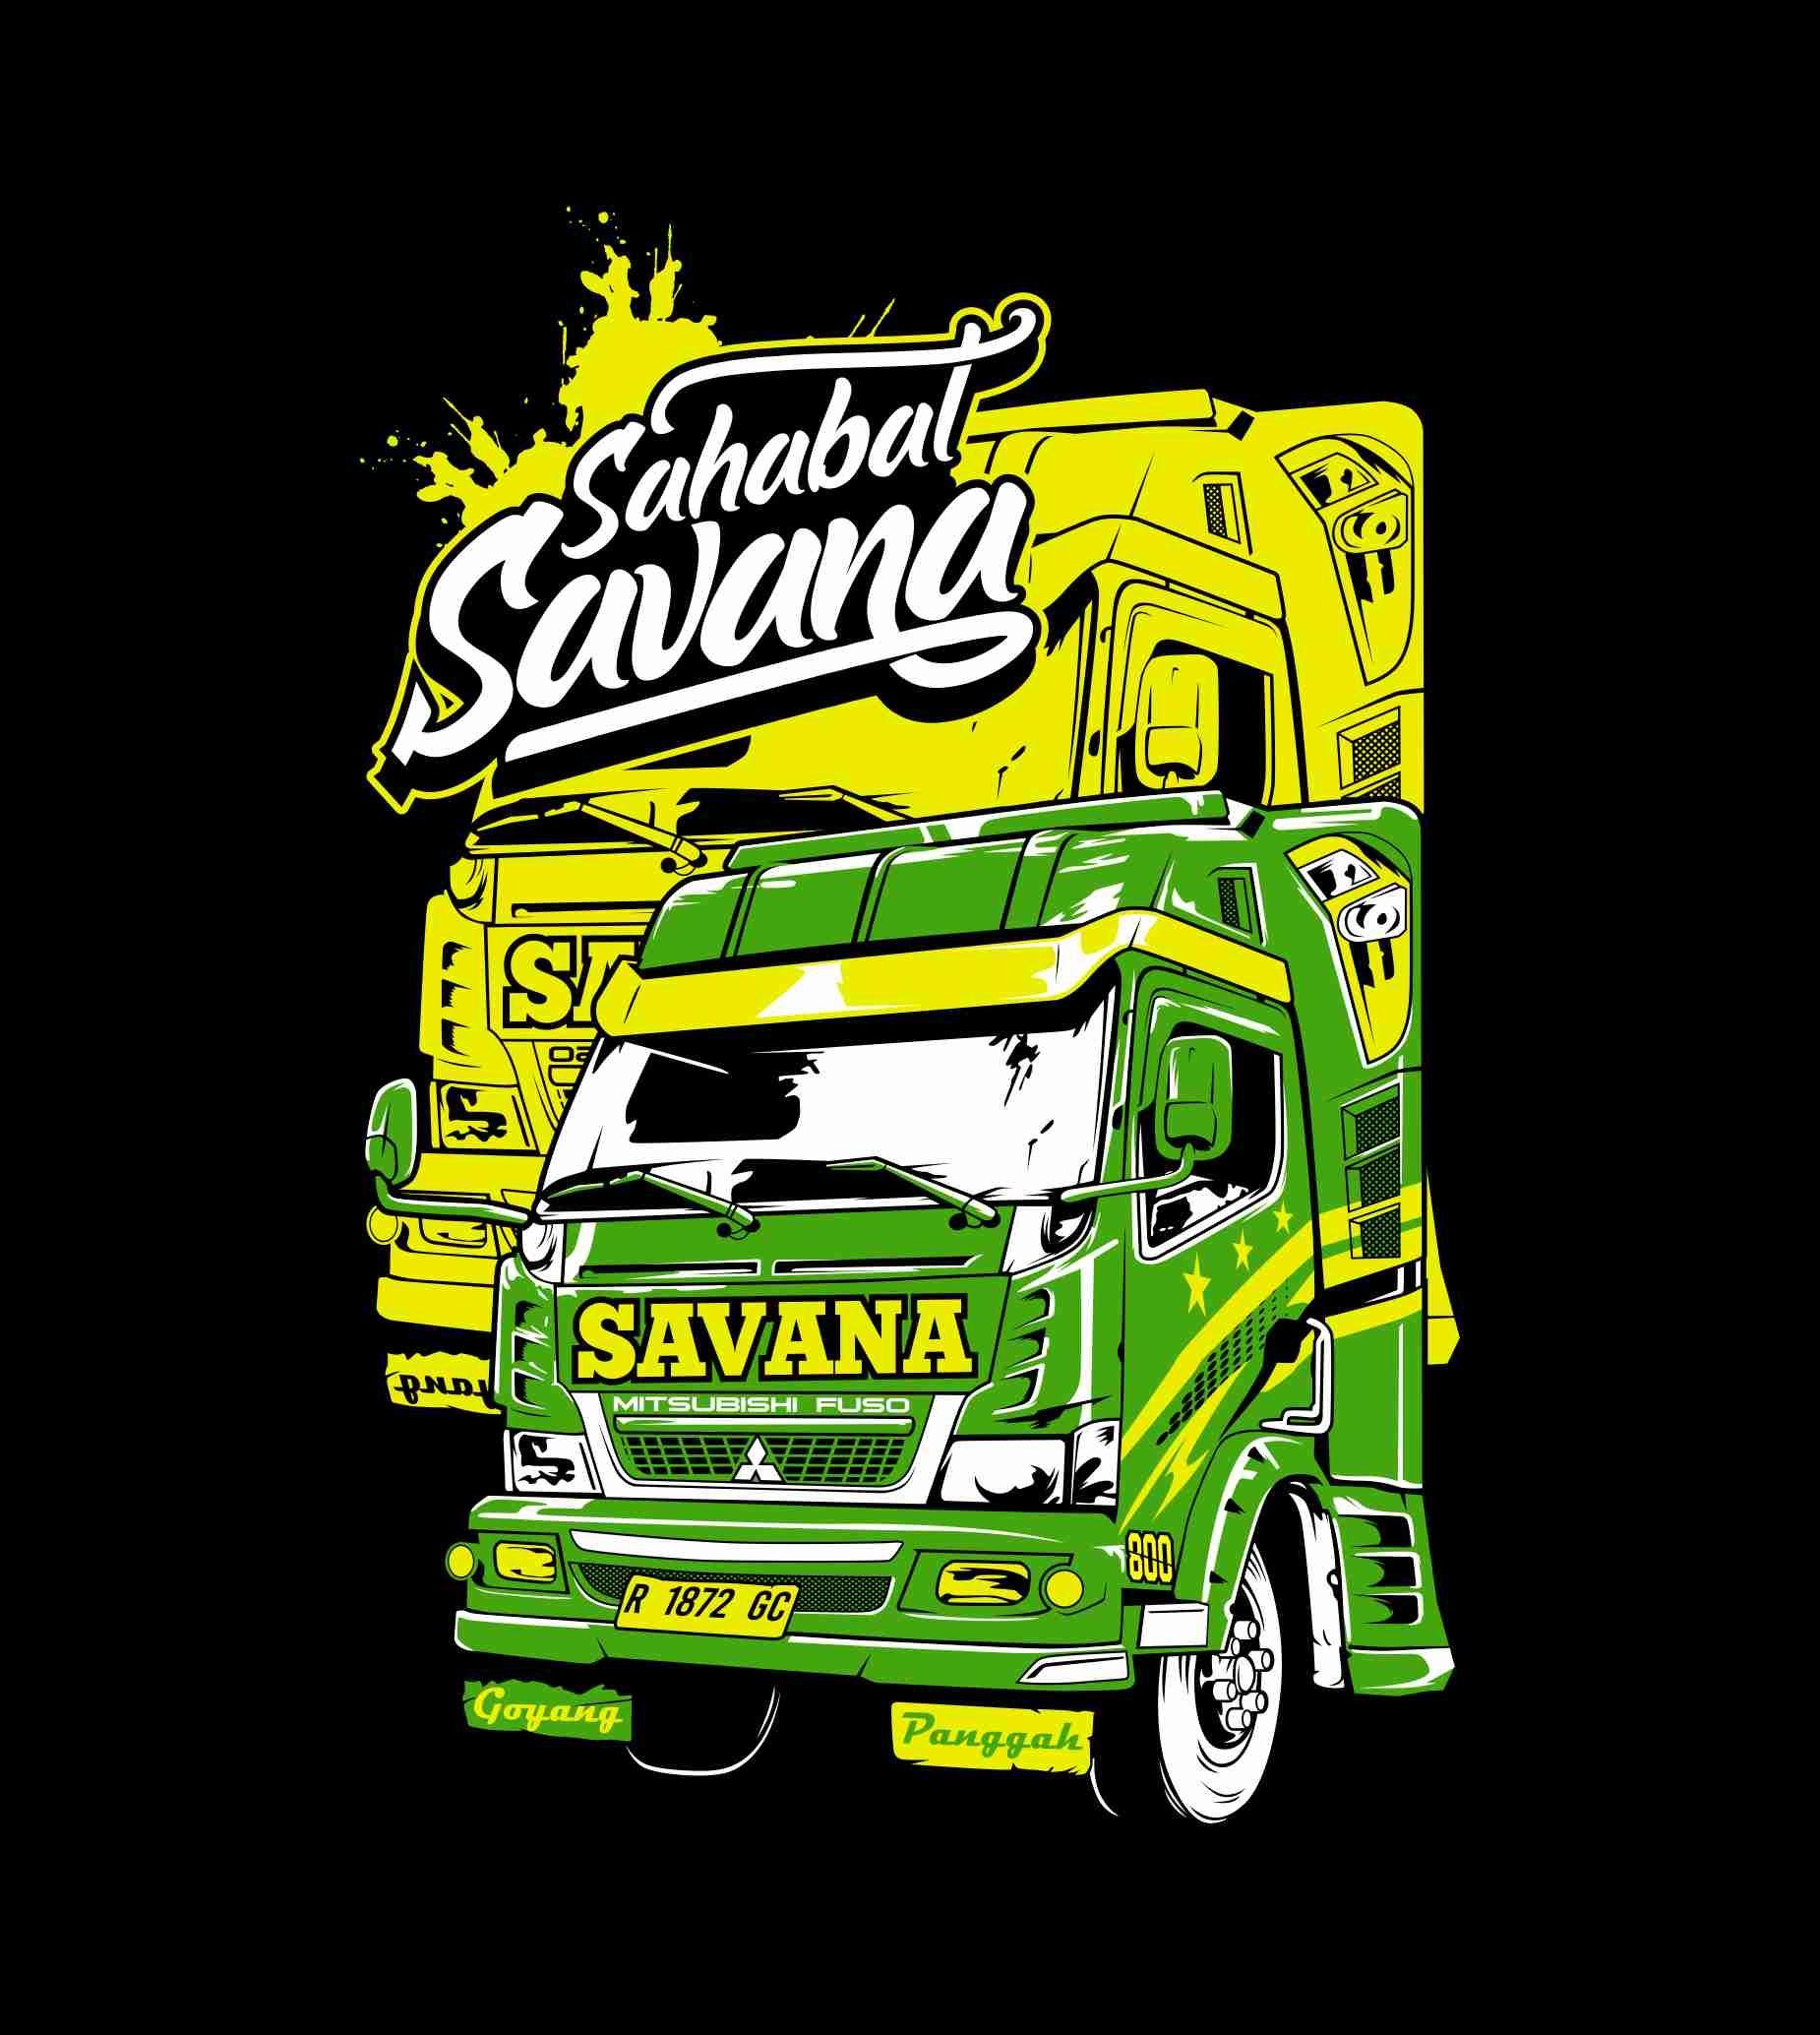 Truk Vector Sahabat Savana Desain Vektor Desain Logo Otomotif Desain Logo